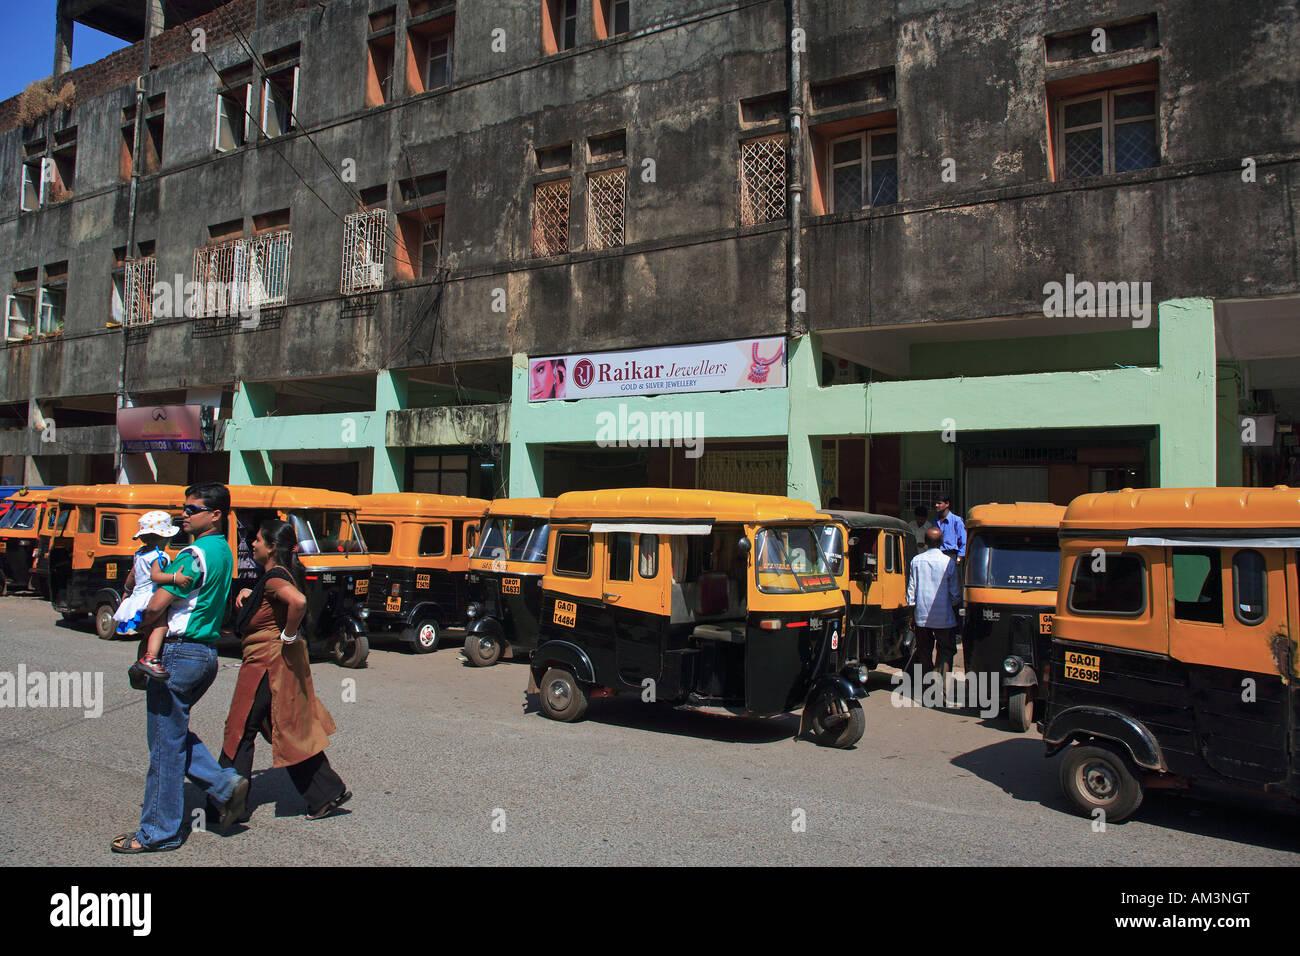 india goa panaji tut tuts lined up in the street - Stock Image